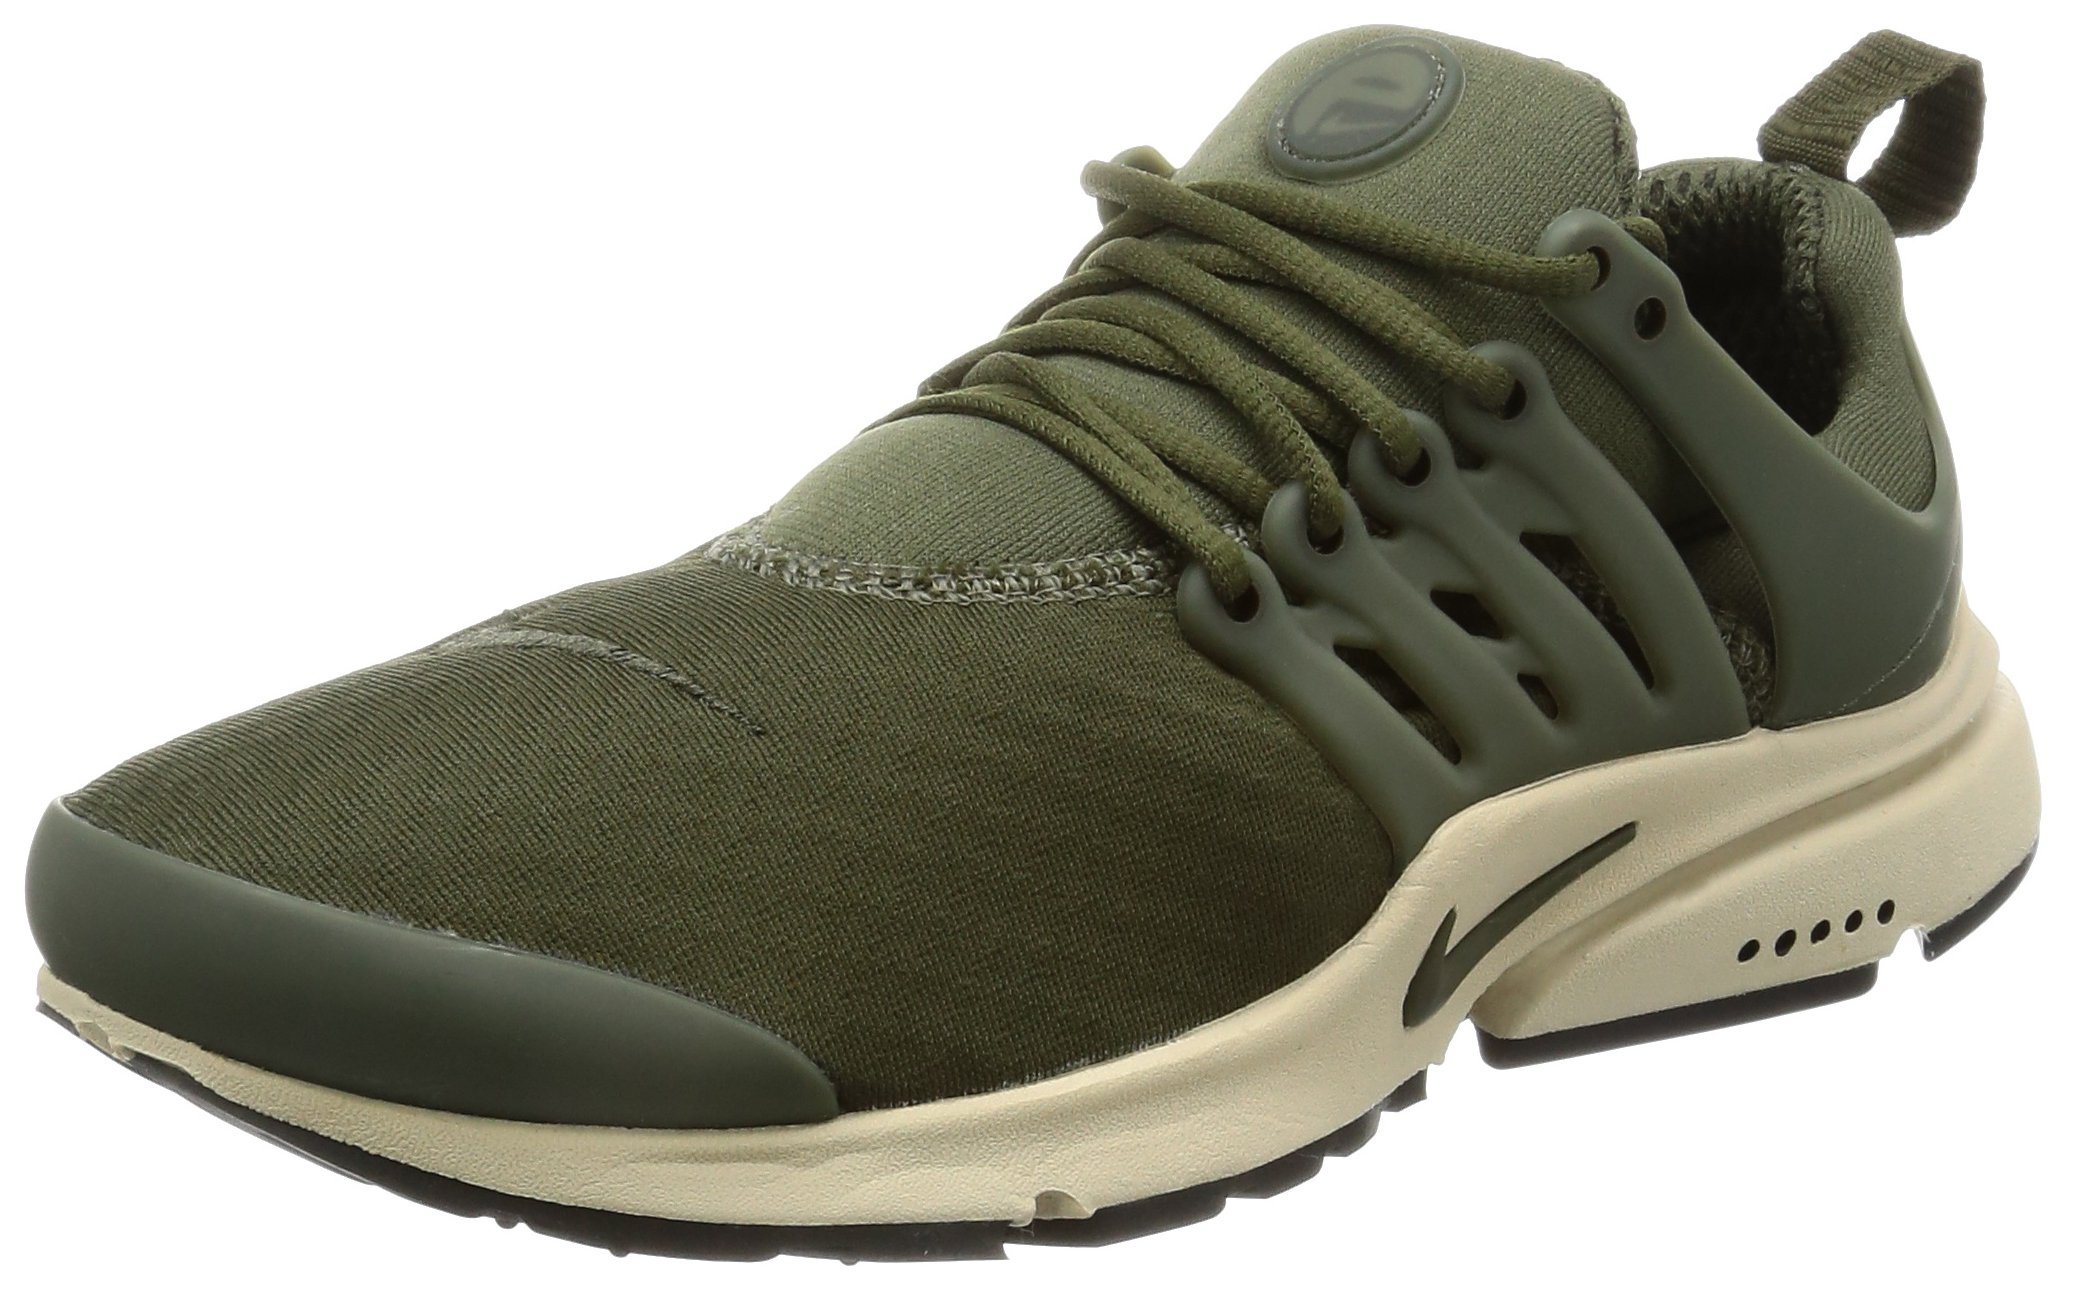 pretty nice b0fa0 ce9fe Galleon - Nike Air Presto Essential Mens Running Trainers 848187 Sneakers  Shoes (US 10, Cargo Khaki Rattan 301)